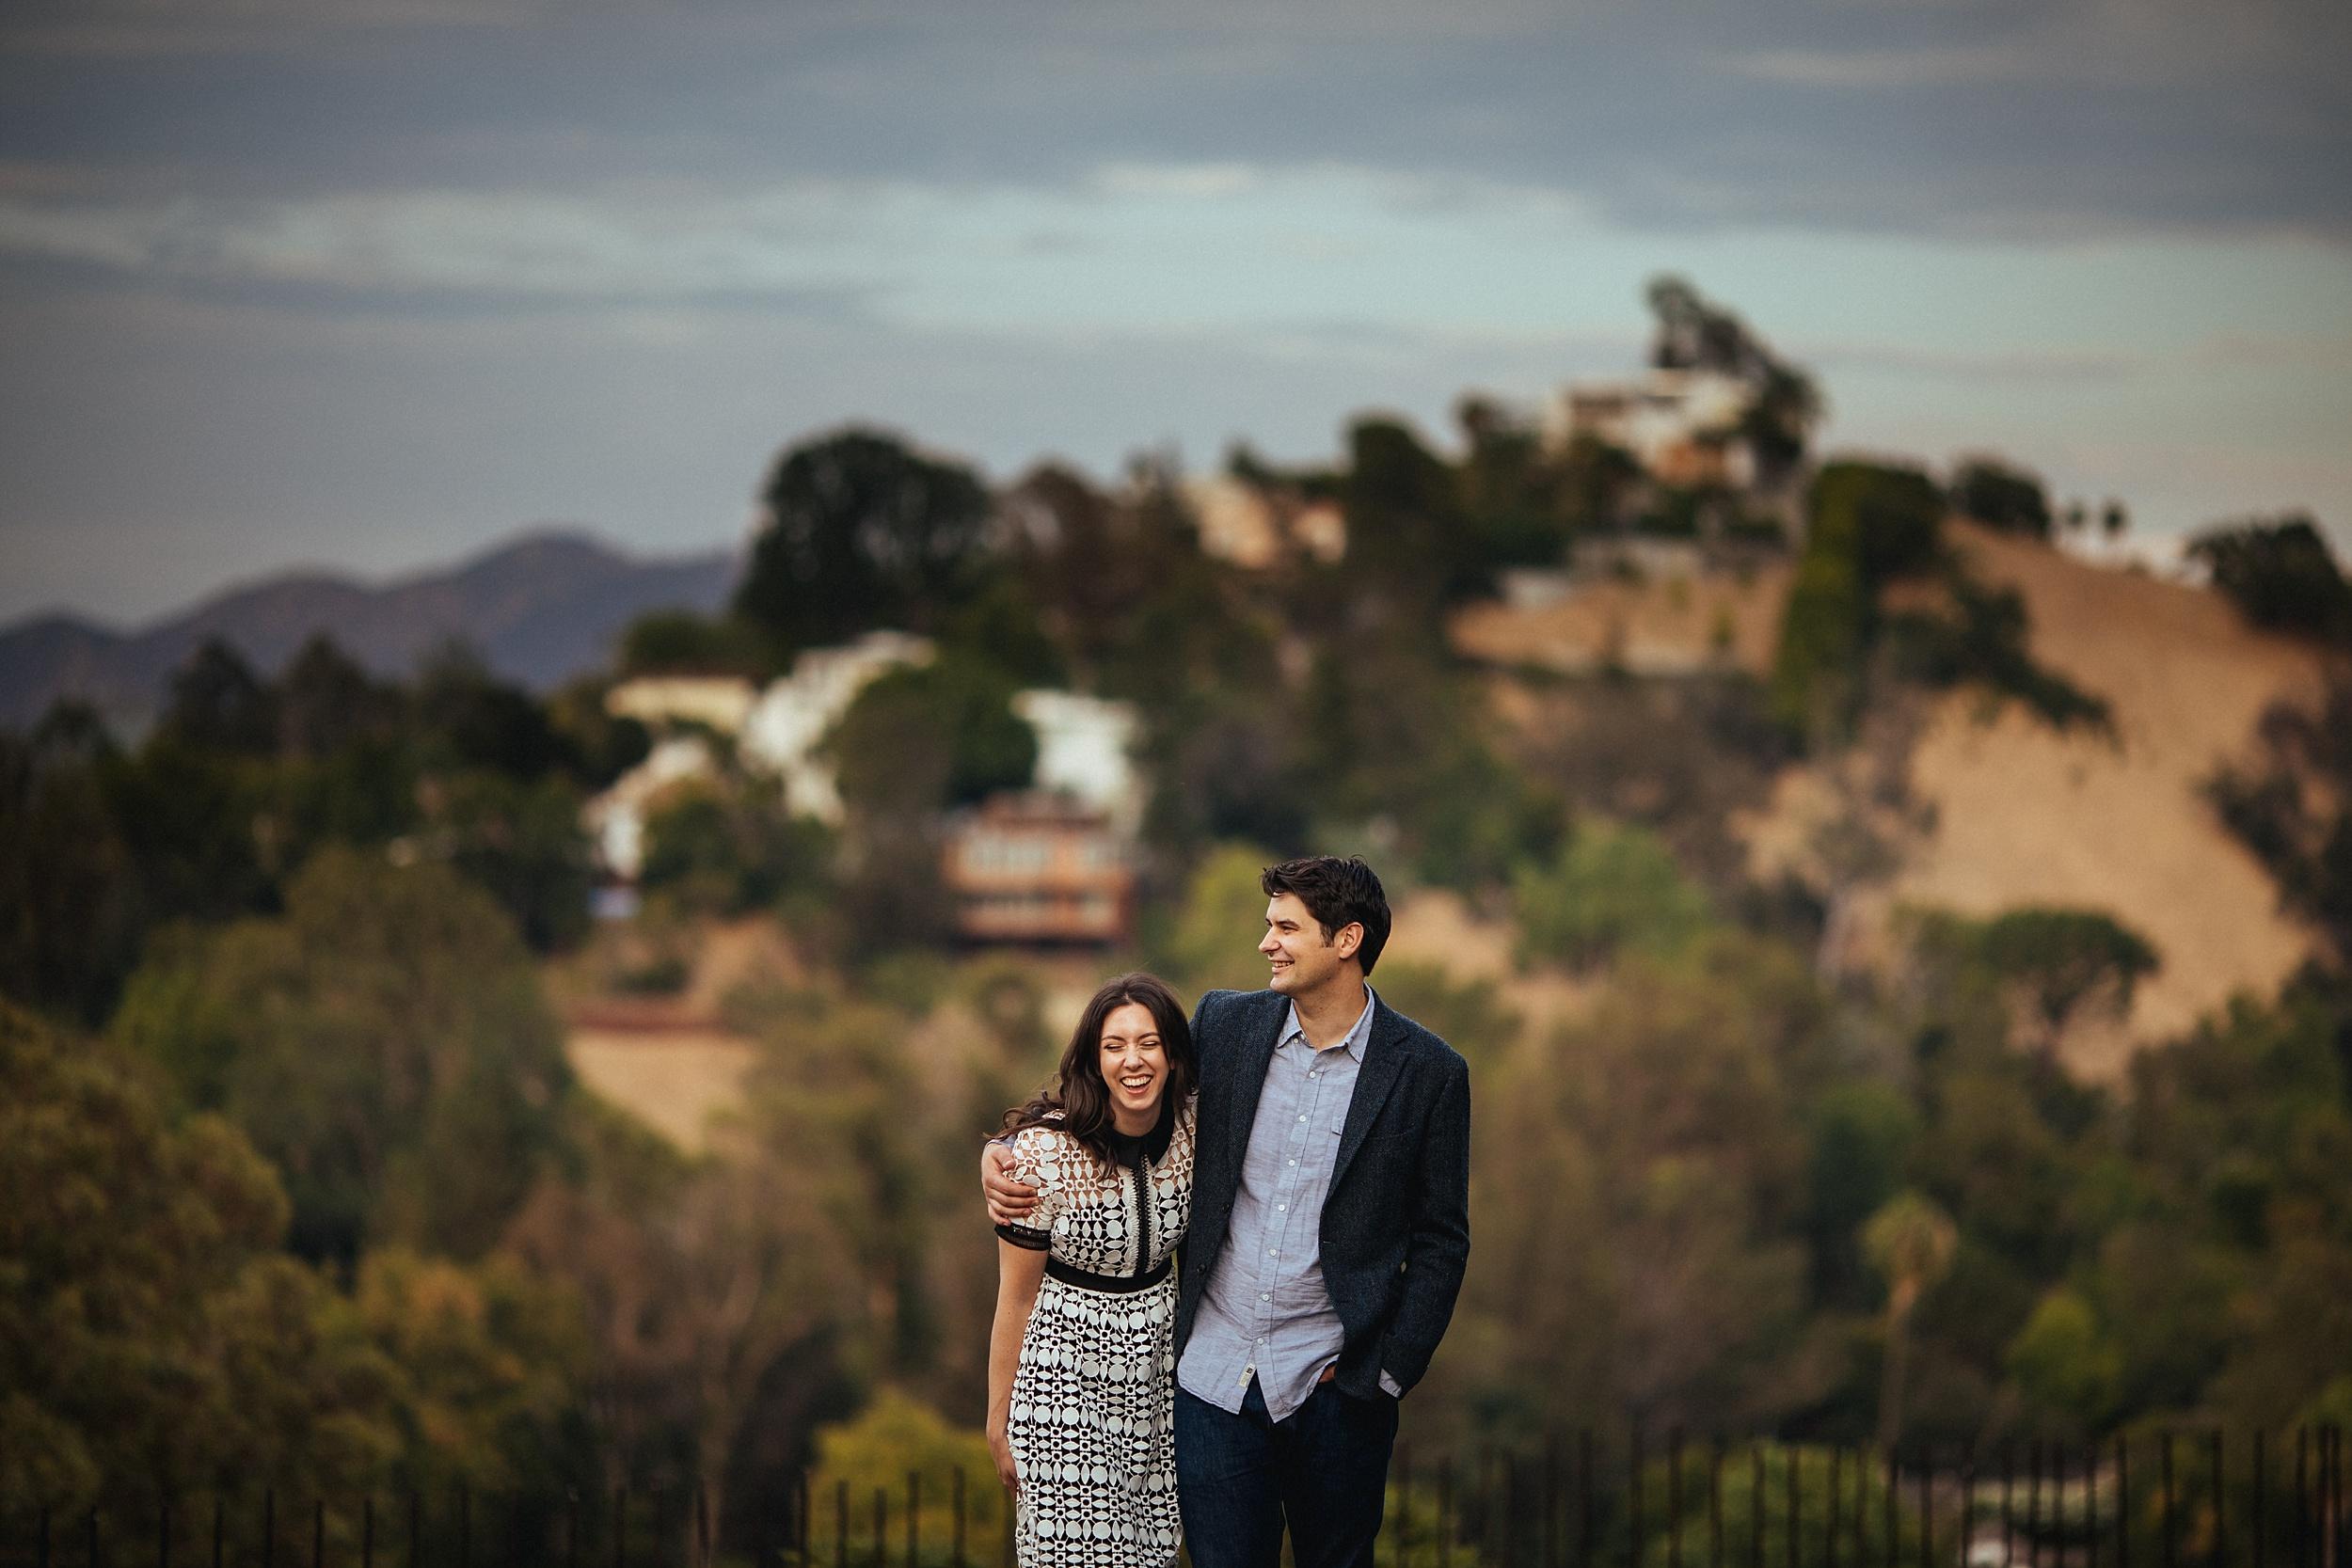 Studio-City-LA-Engagement-10.jpg